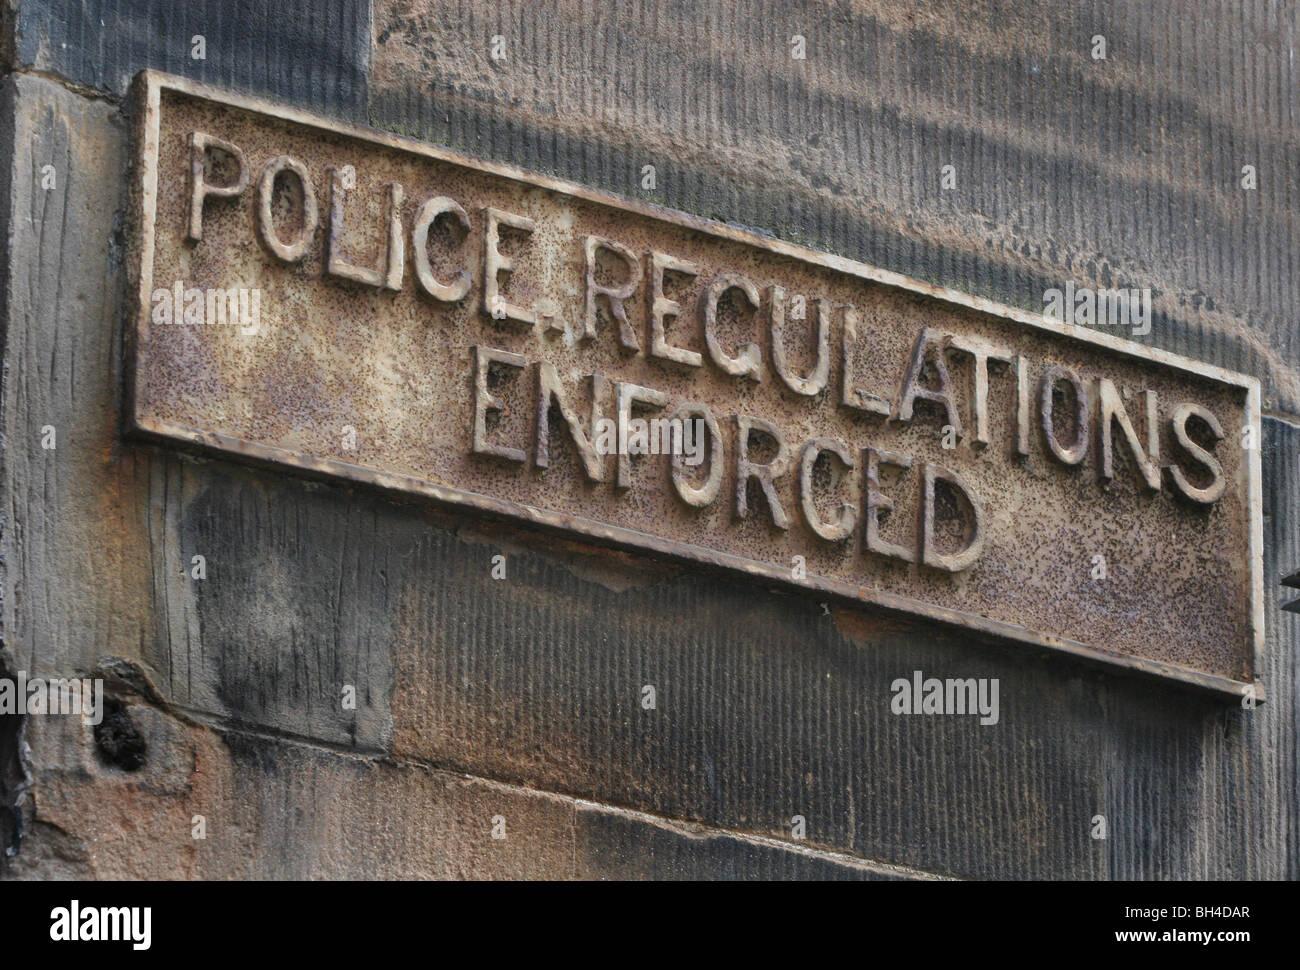 'POLICE REGULATIONS ENFORCED' SIGN, ROSE STREET, EDINBURGH, SCOTLAND.22.08.06 - Stock Image